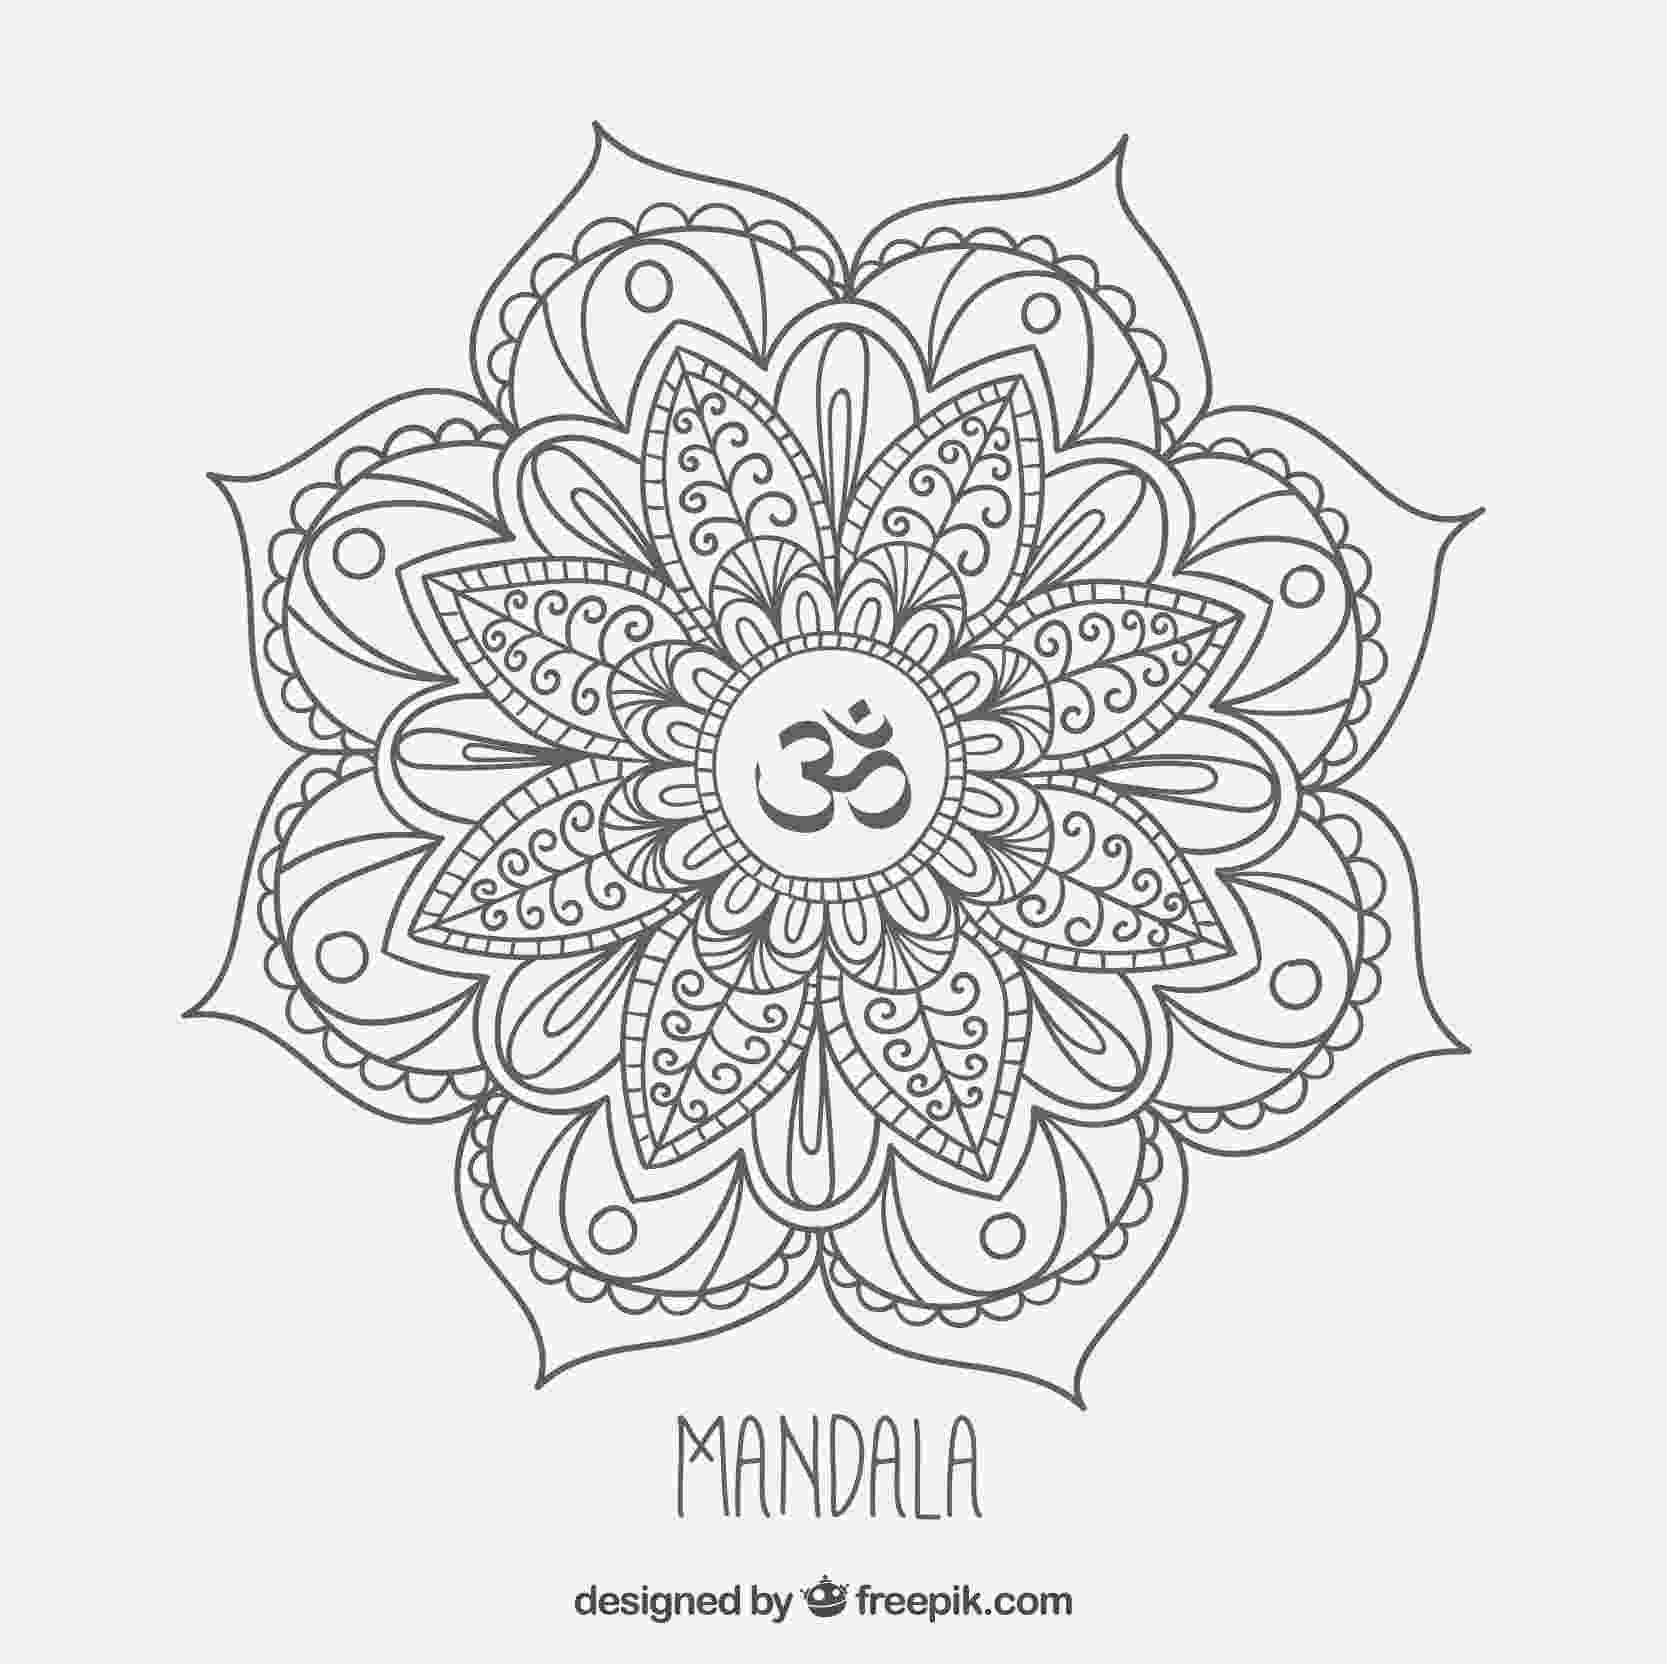 free printable mandala designs book review the art of mandala meditation by michal printable free mandala designs